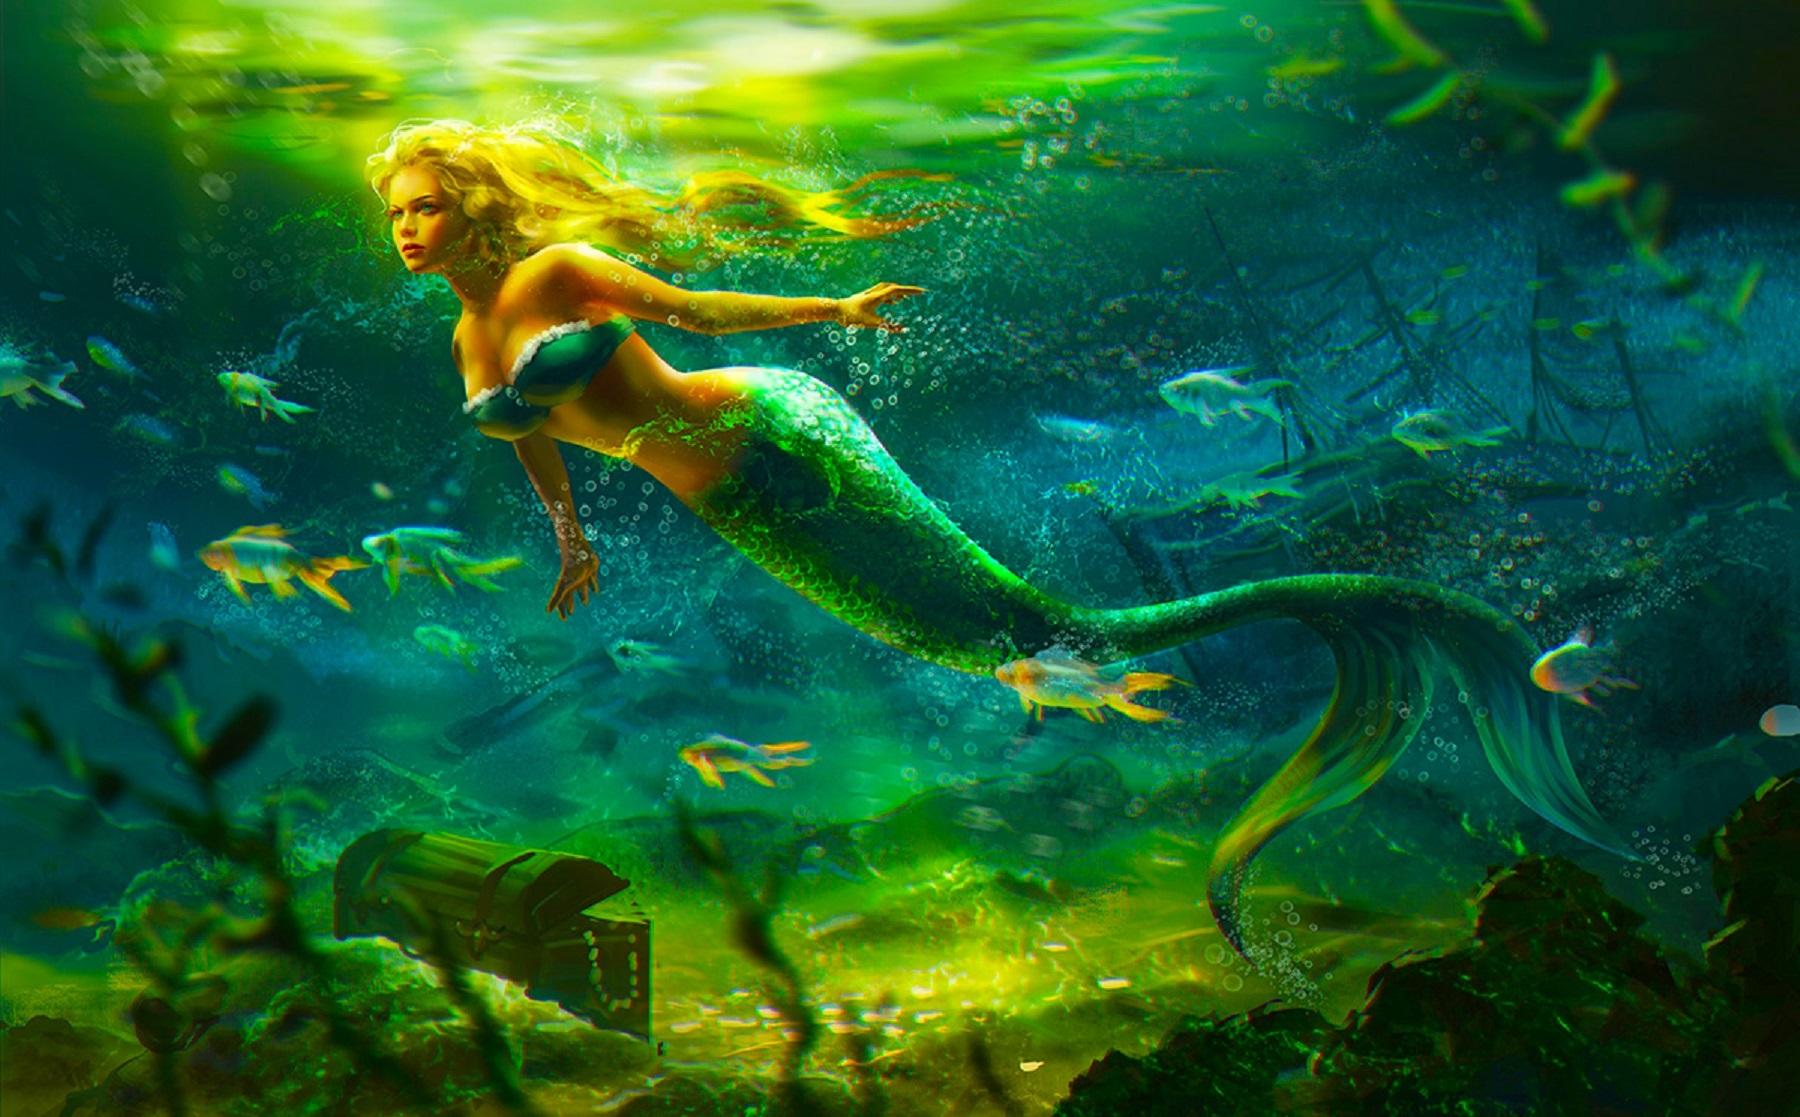 3d Wallpaper Under The Sea Mermaid Fantasy Photo 38079539 Fanpop